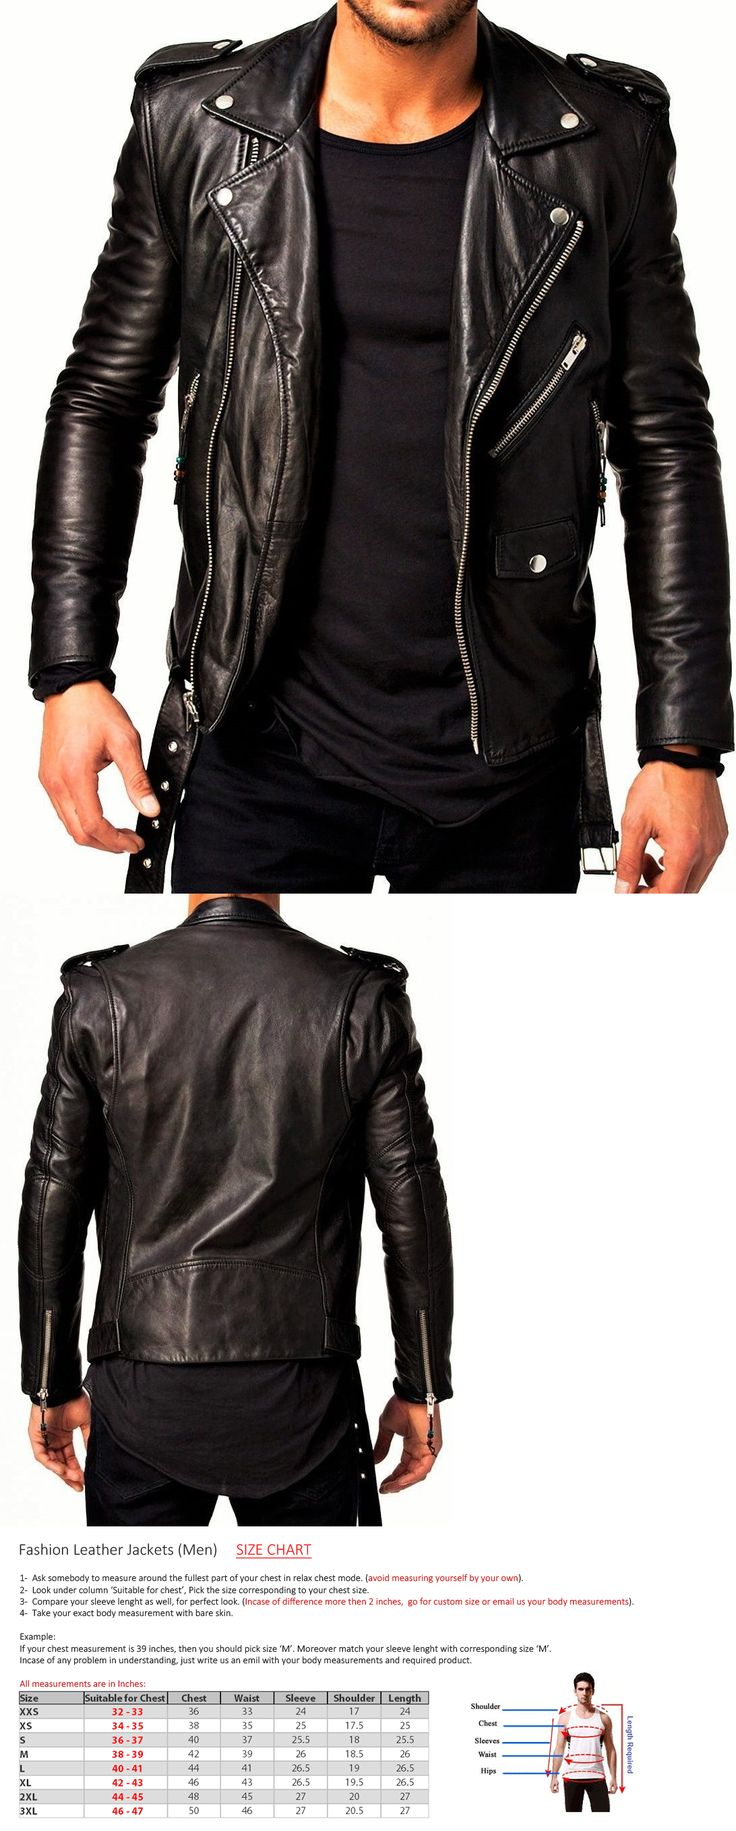 Men Coats And Jackets: New Mens Leather Jacket Black Slim Fit Biker Motorcycle Genuine Lambskin -> BUY IT NOW ONLY: $80 on eBay!